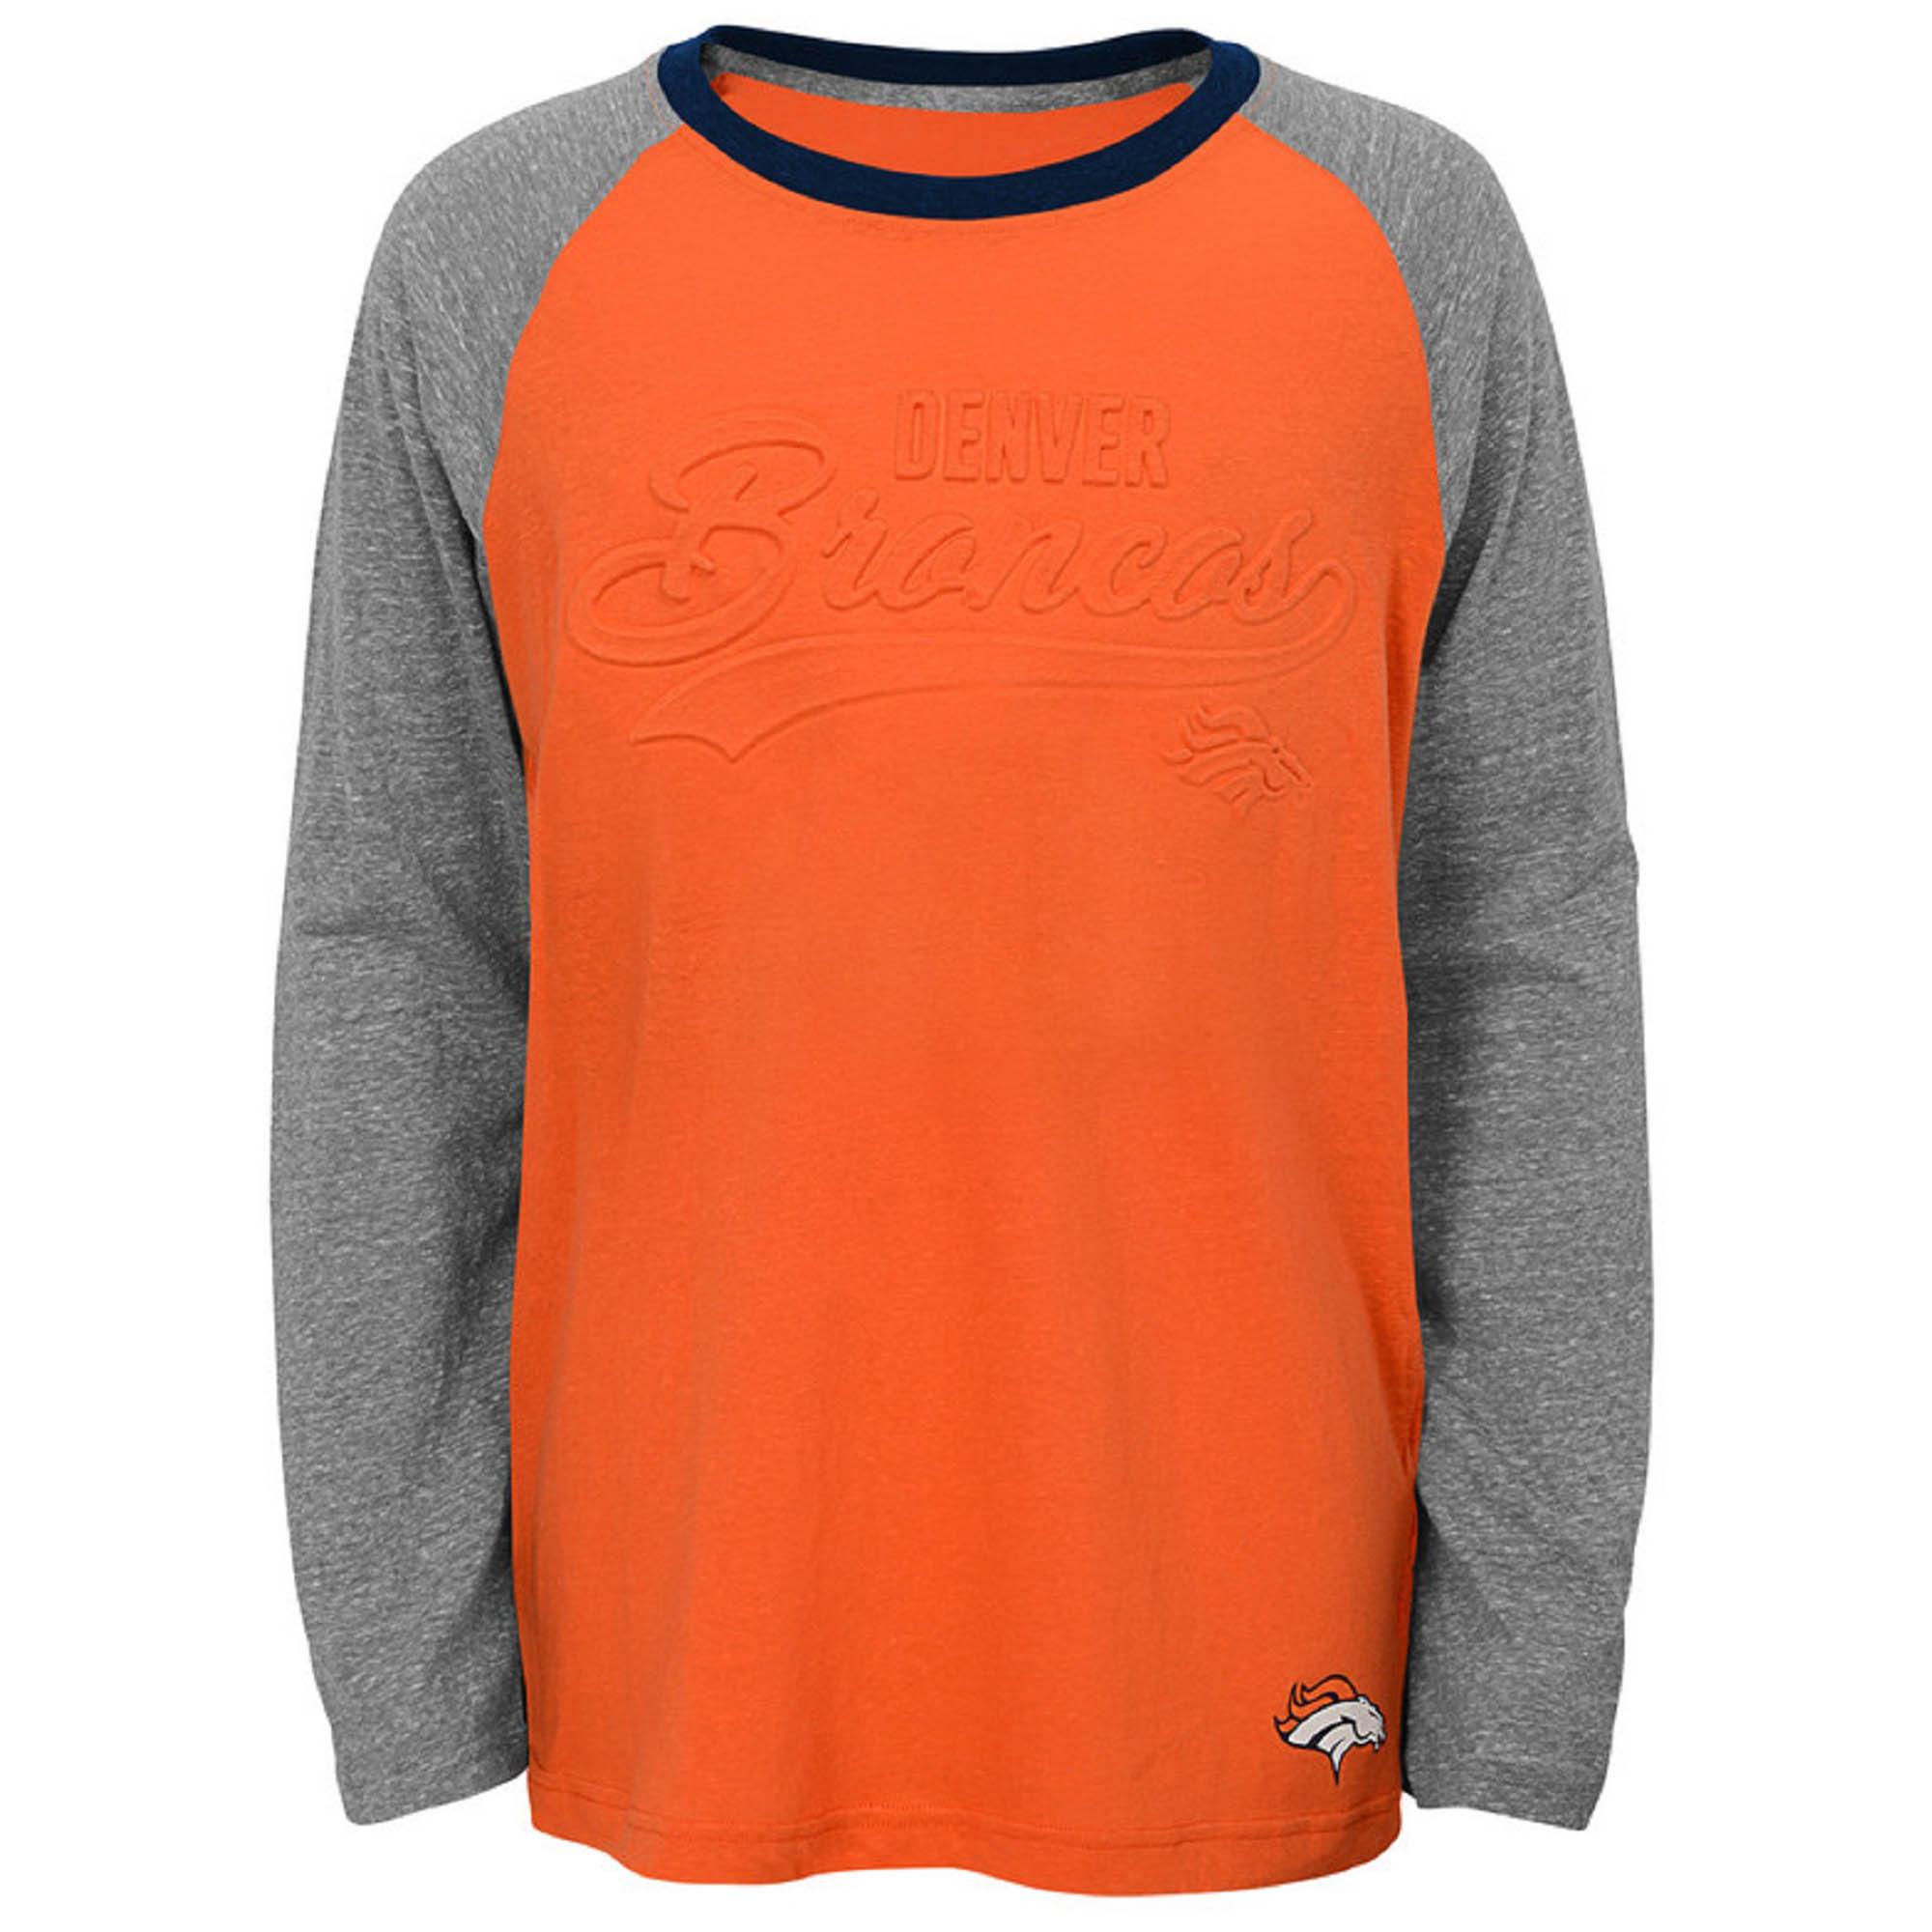 Youth Orange Denver Broncos Long Sleeve Raglan T-Shirt